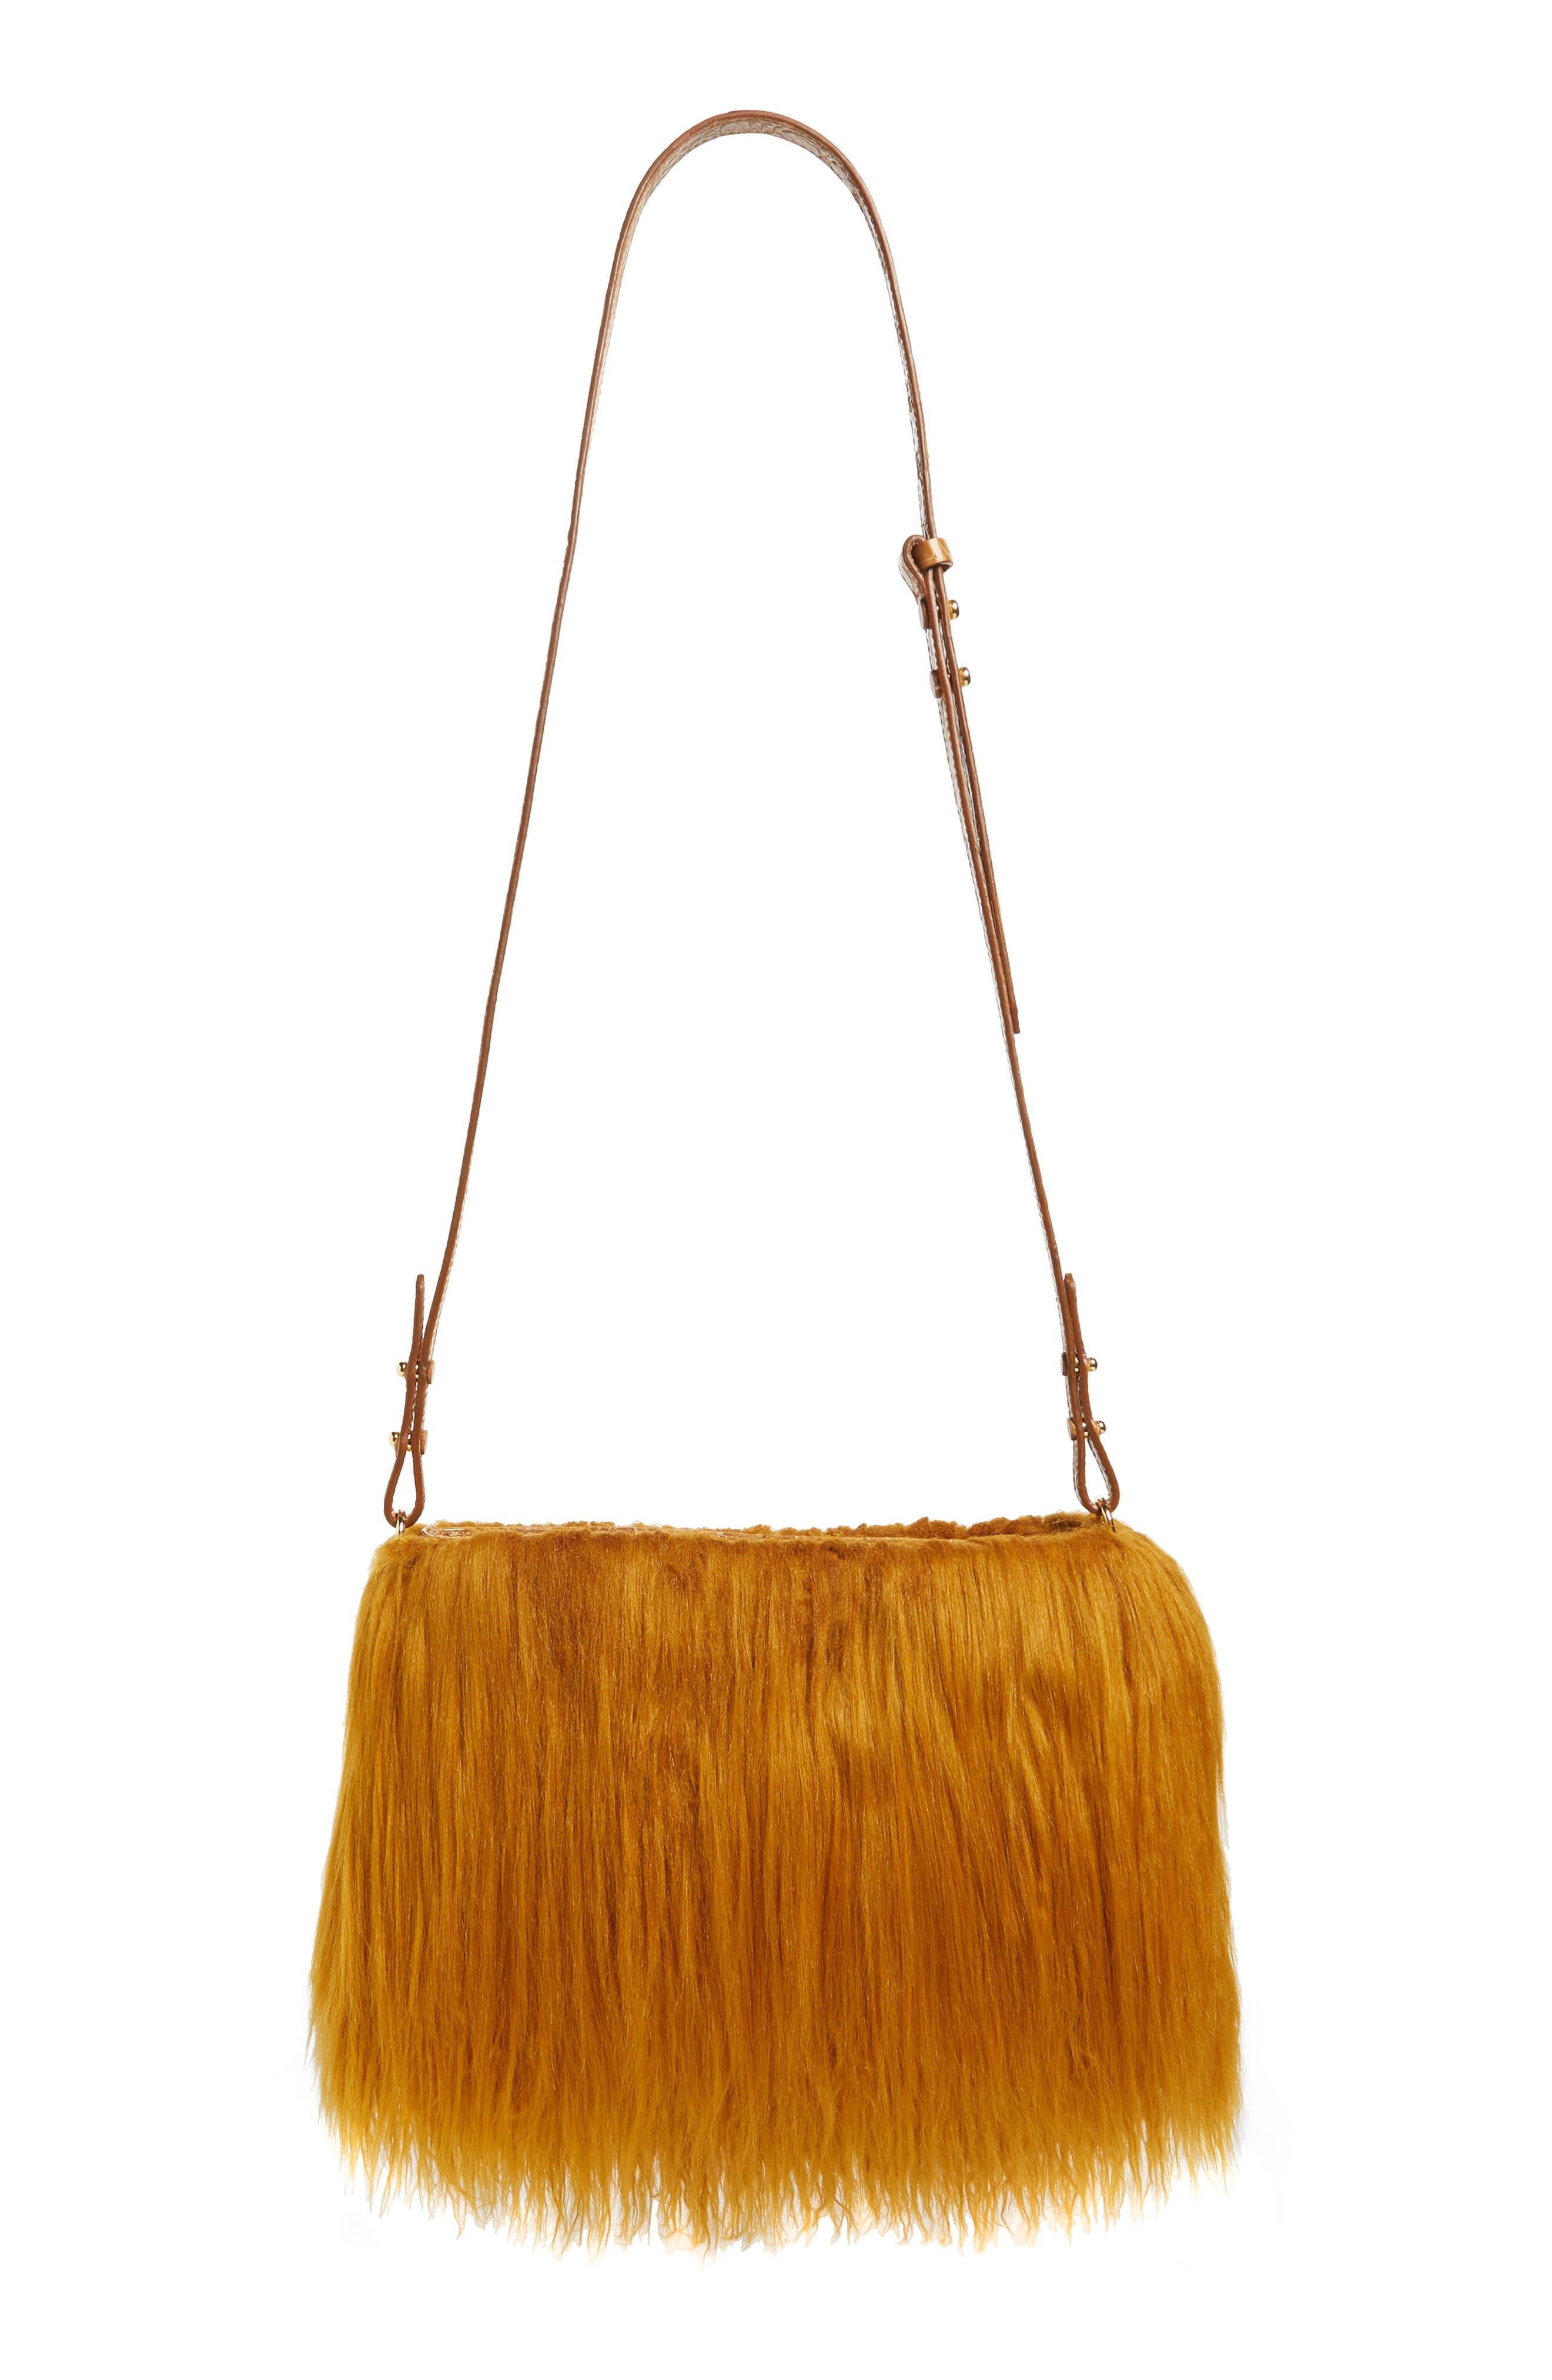 Faux Shearling Crossbody Bag,                             Alternate thumbnail 2, color,                             GOLD